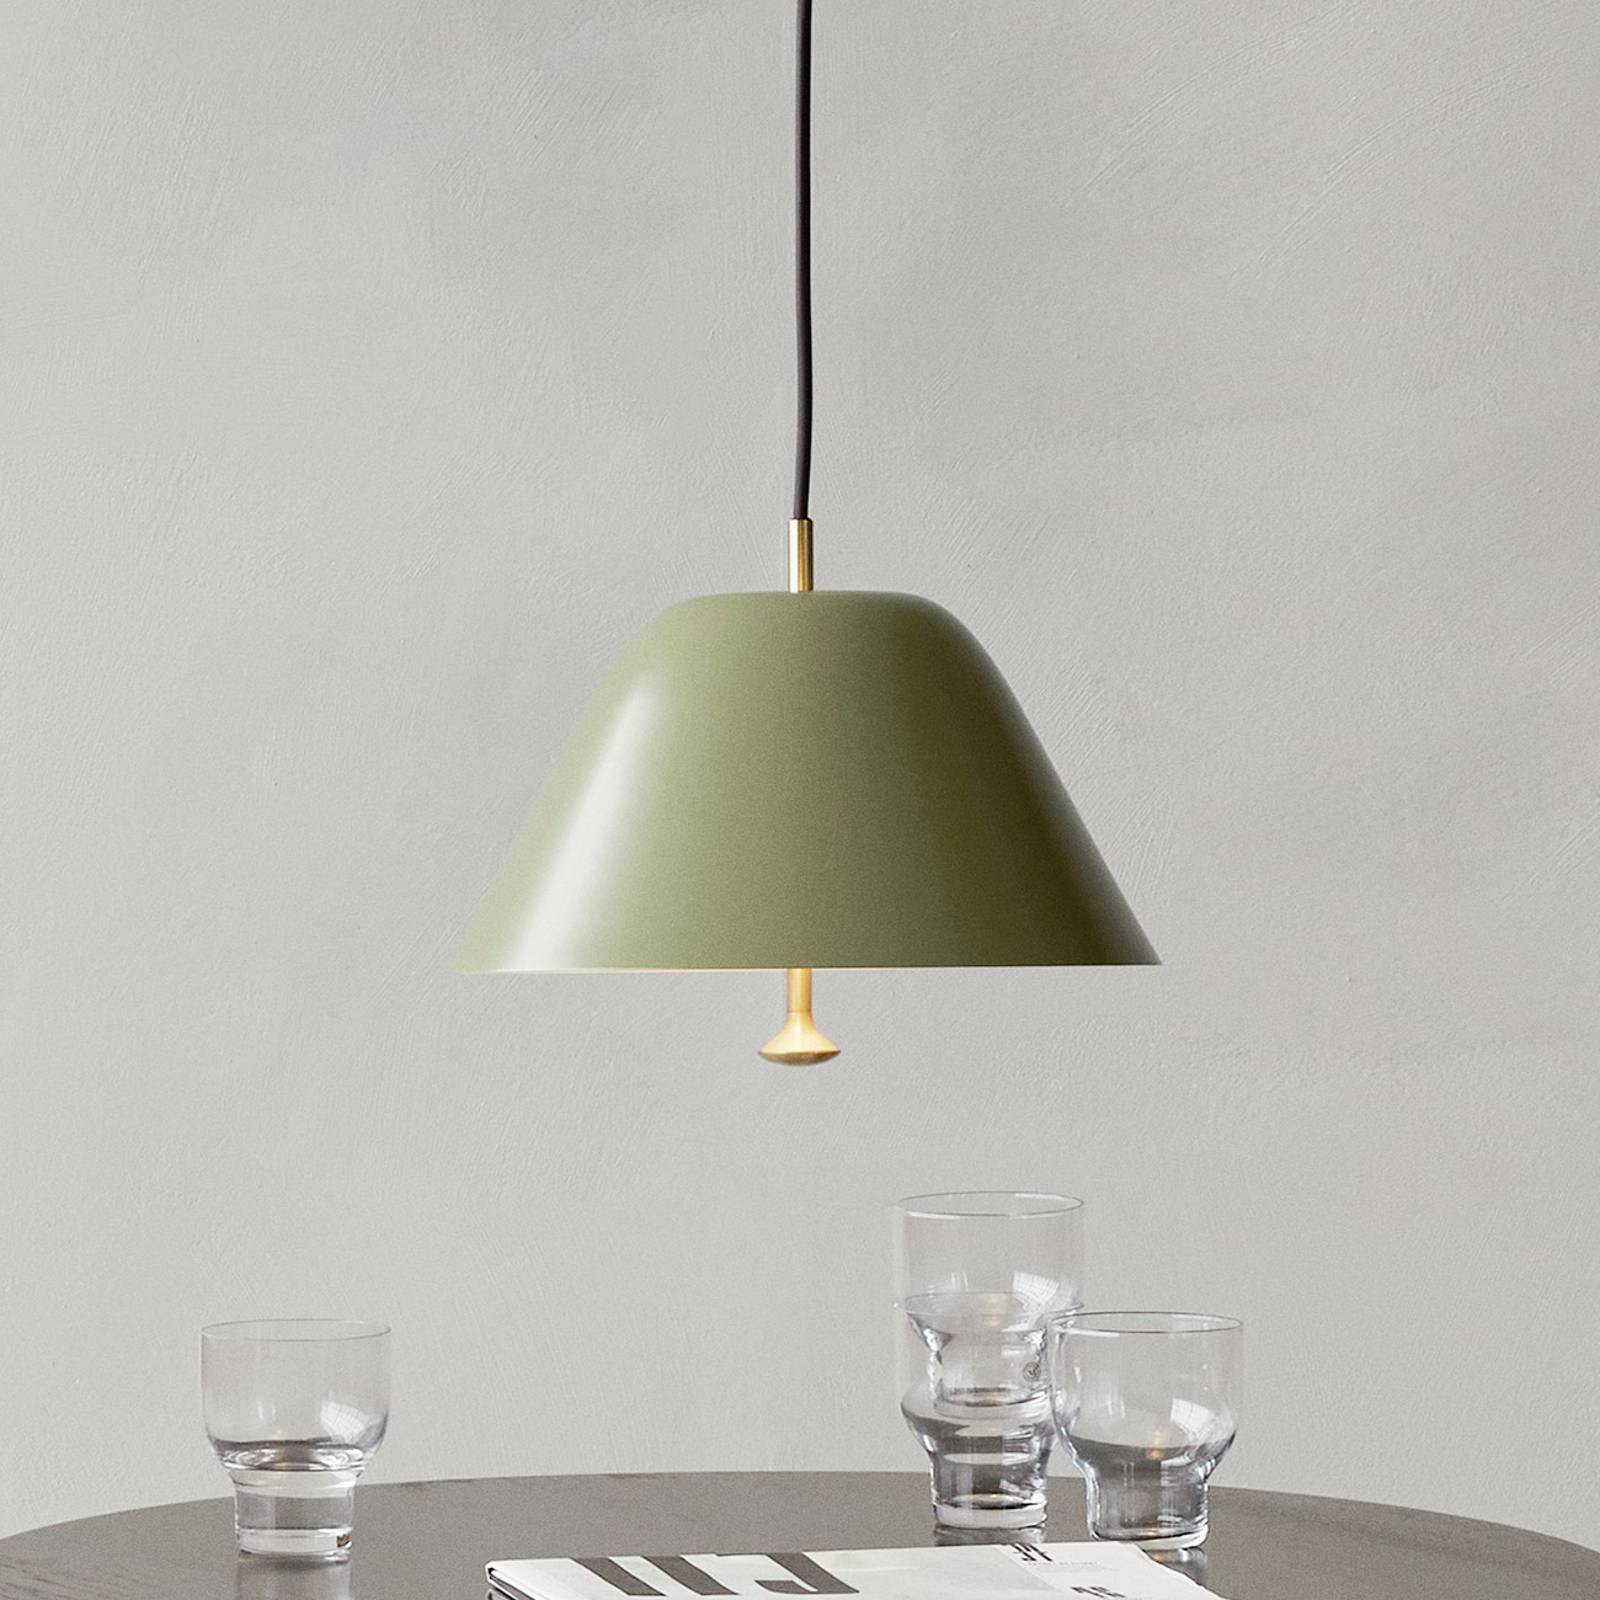 Menu Levitate hanglamp Ø 40 cm saliegroen